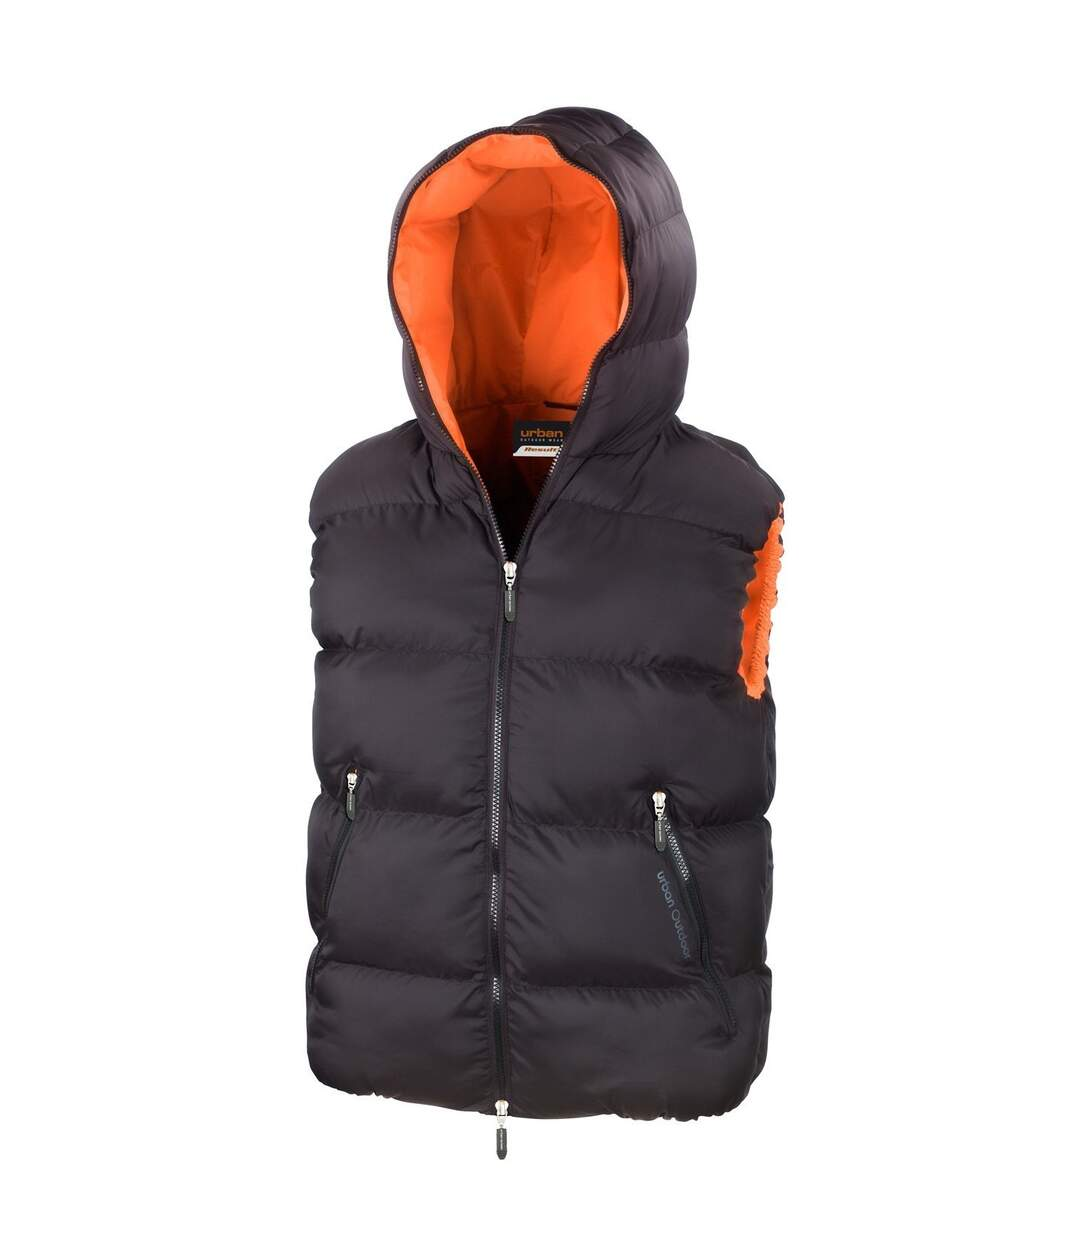 Result Mens Dax Urban Outdoor Gilet Waterproof Windproof Jacket (Black) - UTBC889